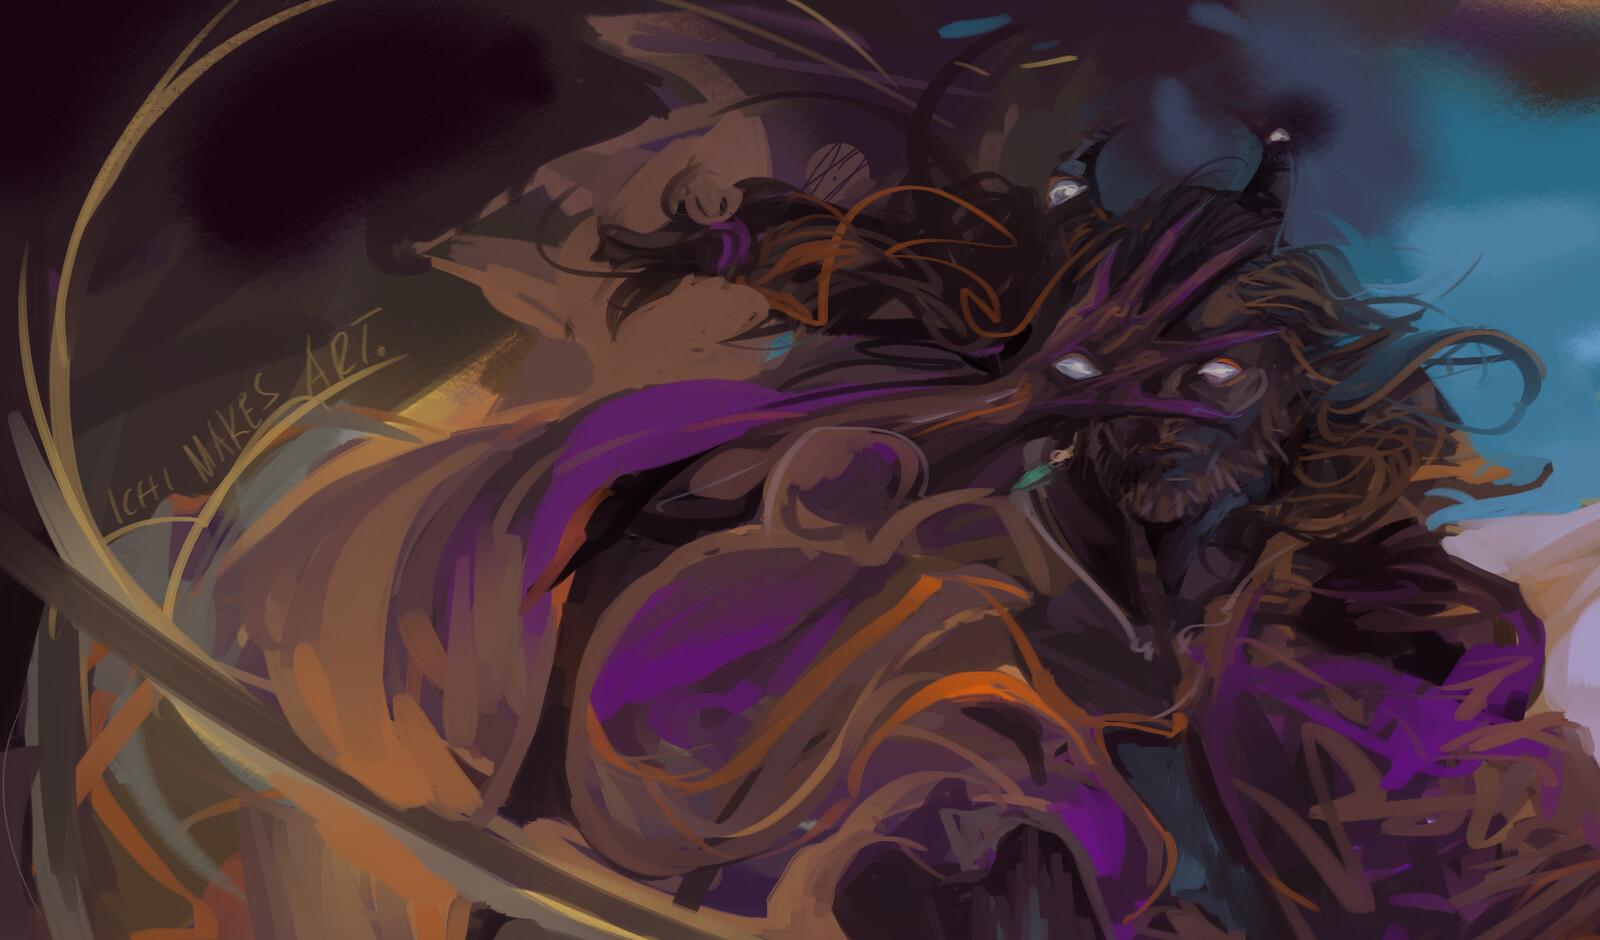 Iaron - violetfoxsketches.tumblr.com